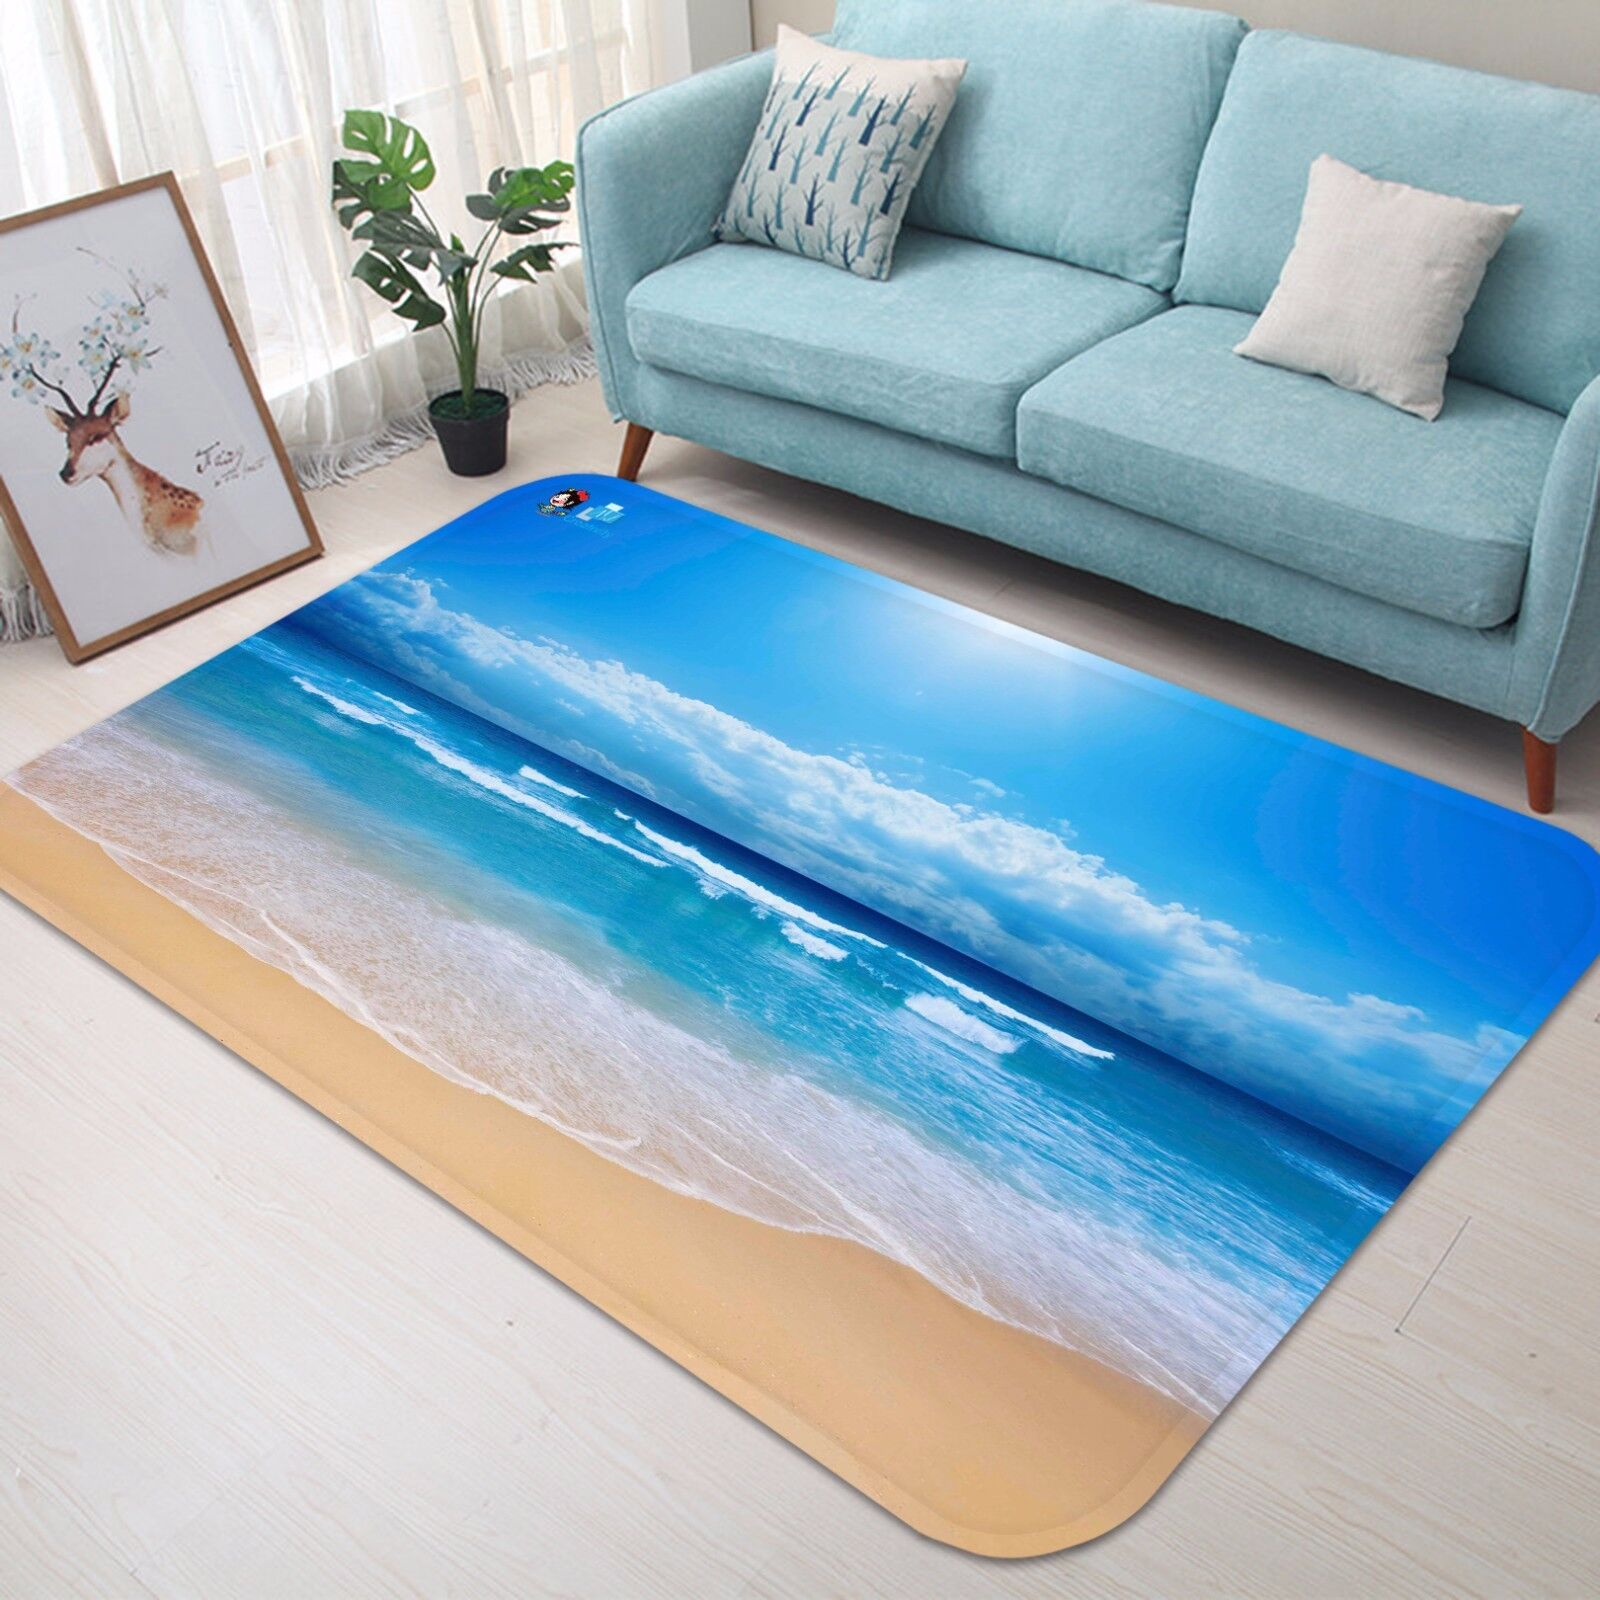 Cielo De Playa 3D 416 Alfombra Colchoneta Antideslizante Alfombra De Sala Elegante De Calidad Foto Alfombra